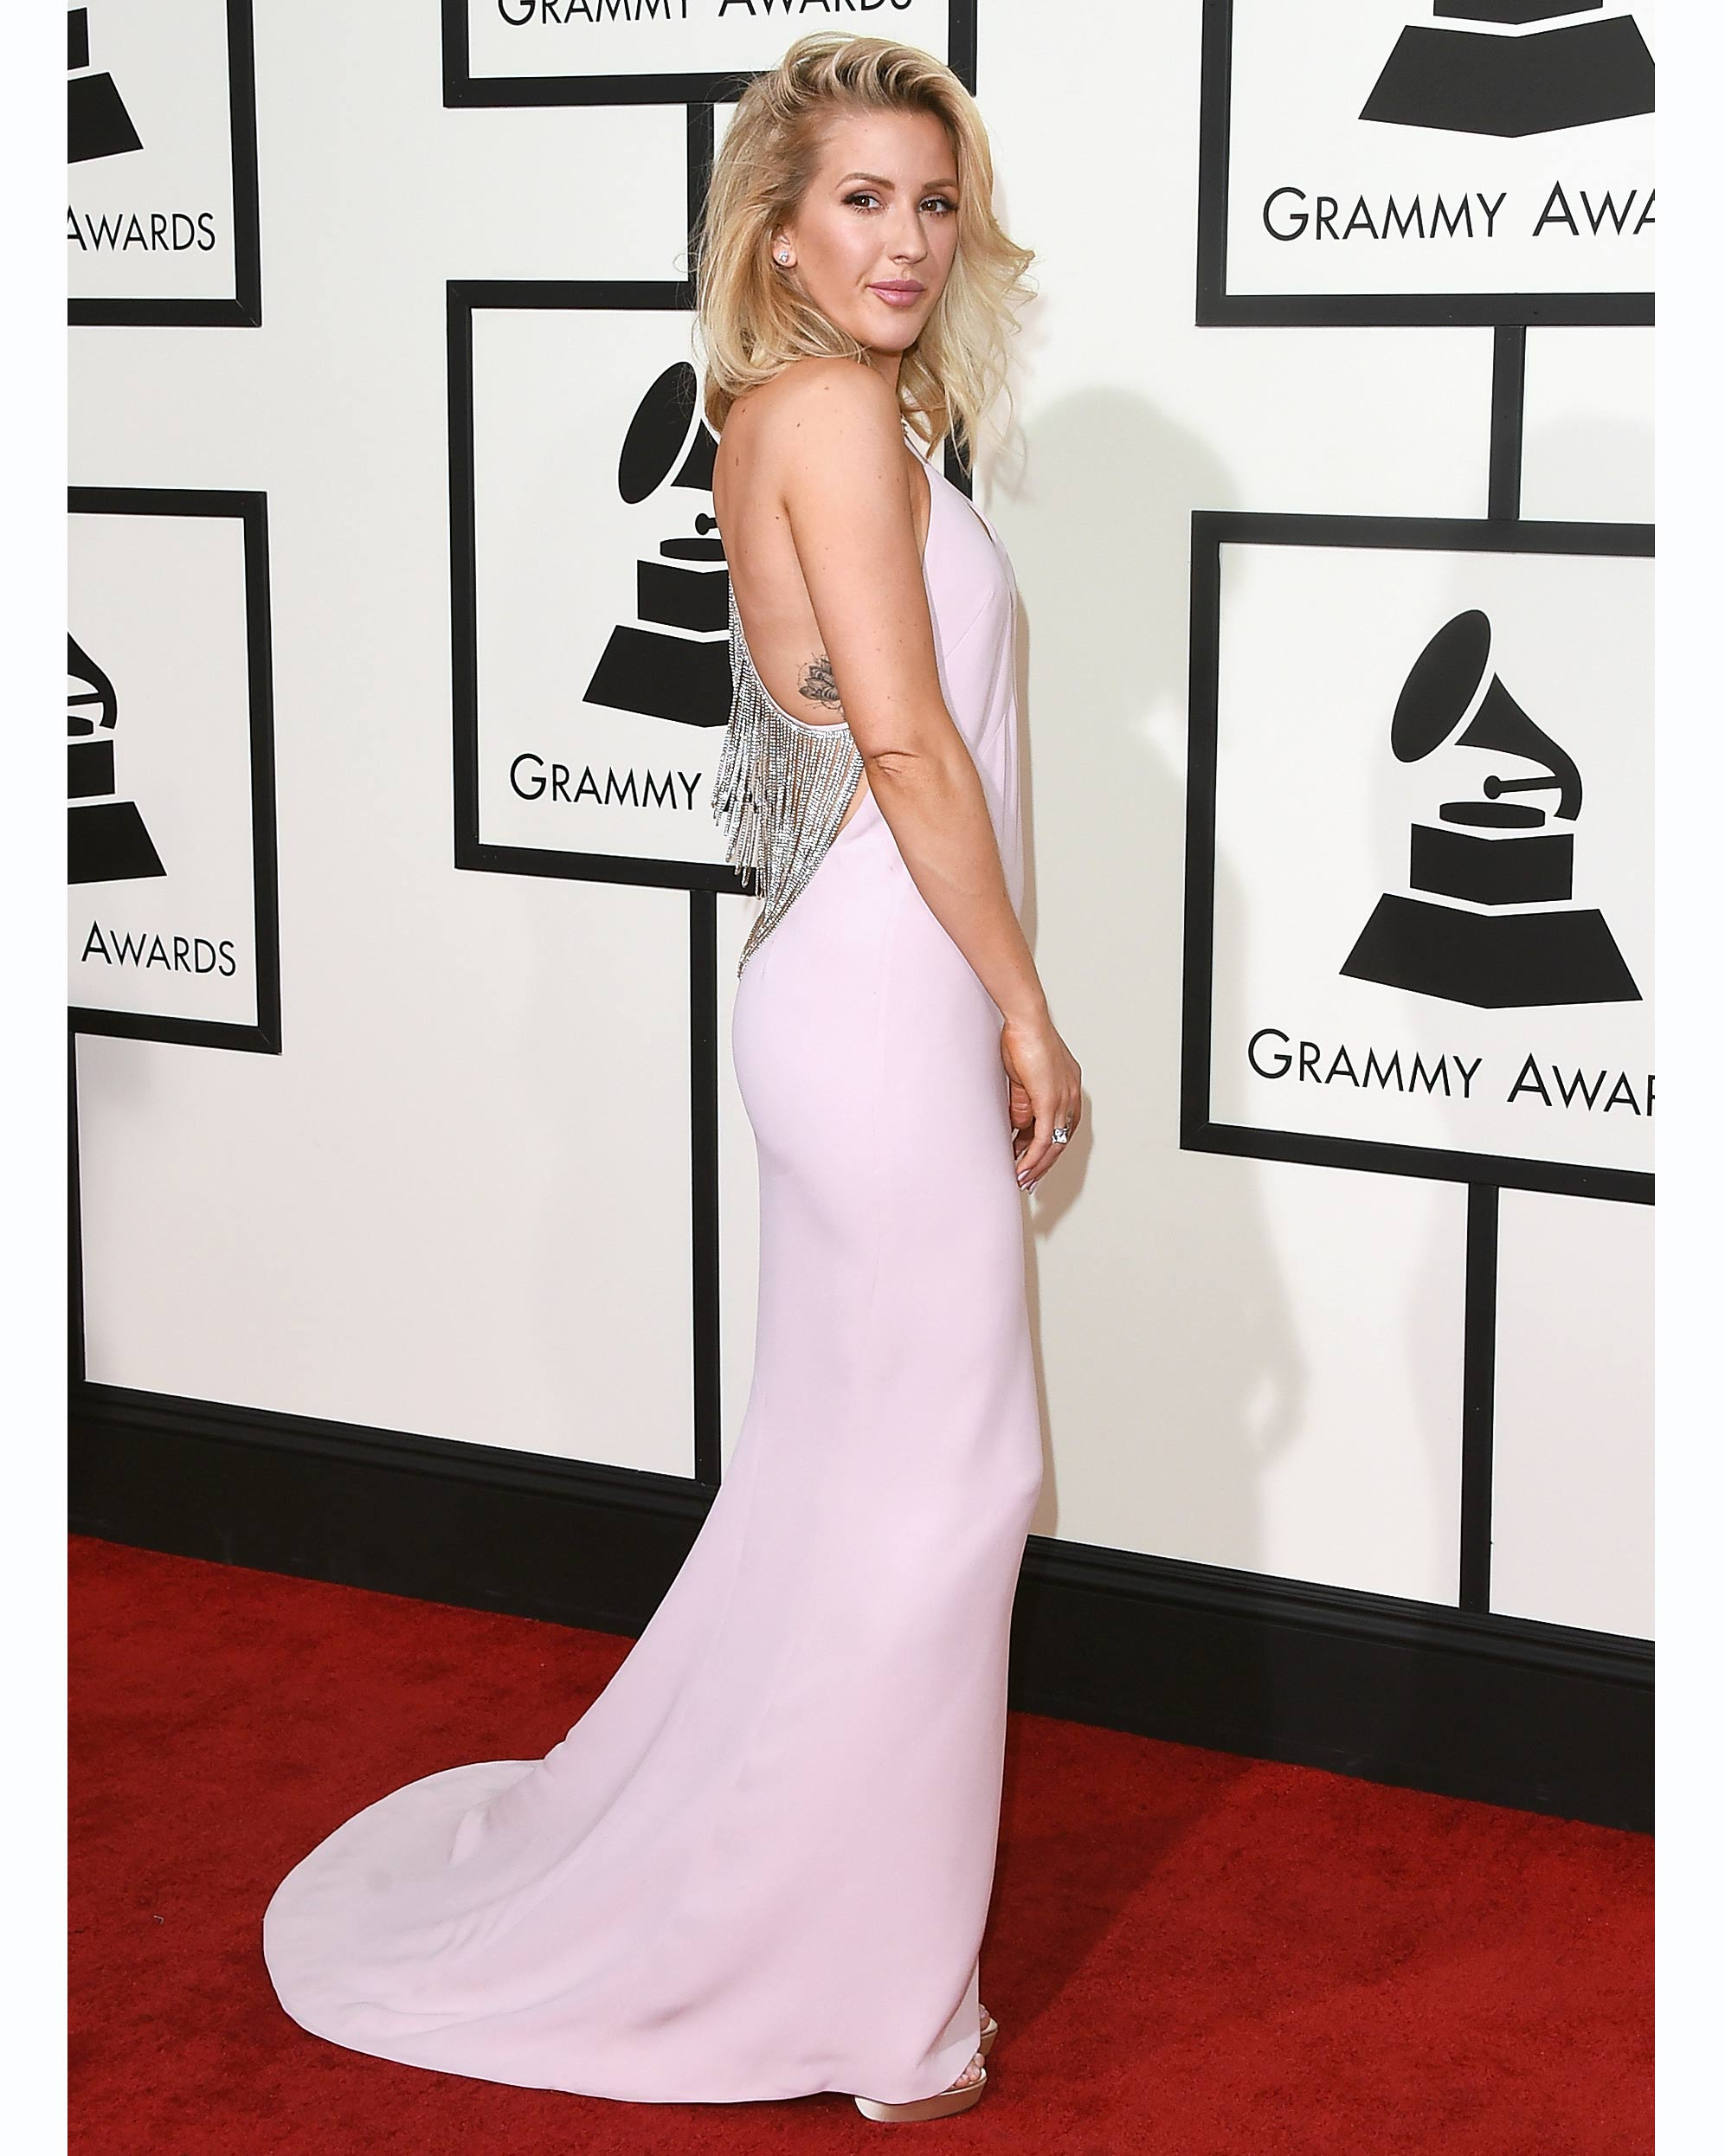 grammy-awards-2016-dresses-ellie-goulding-0216.jpg